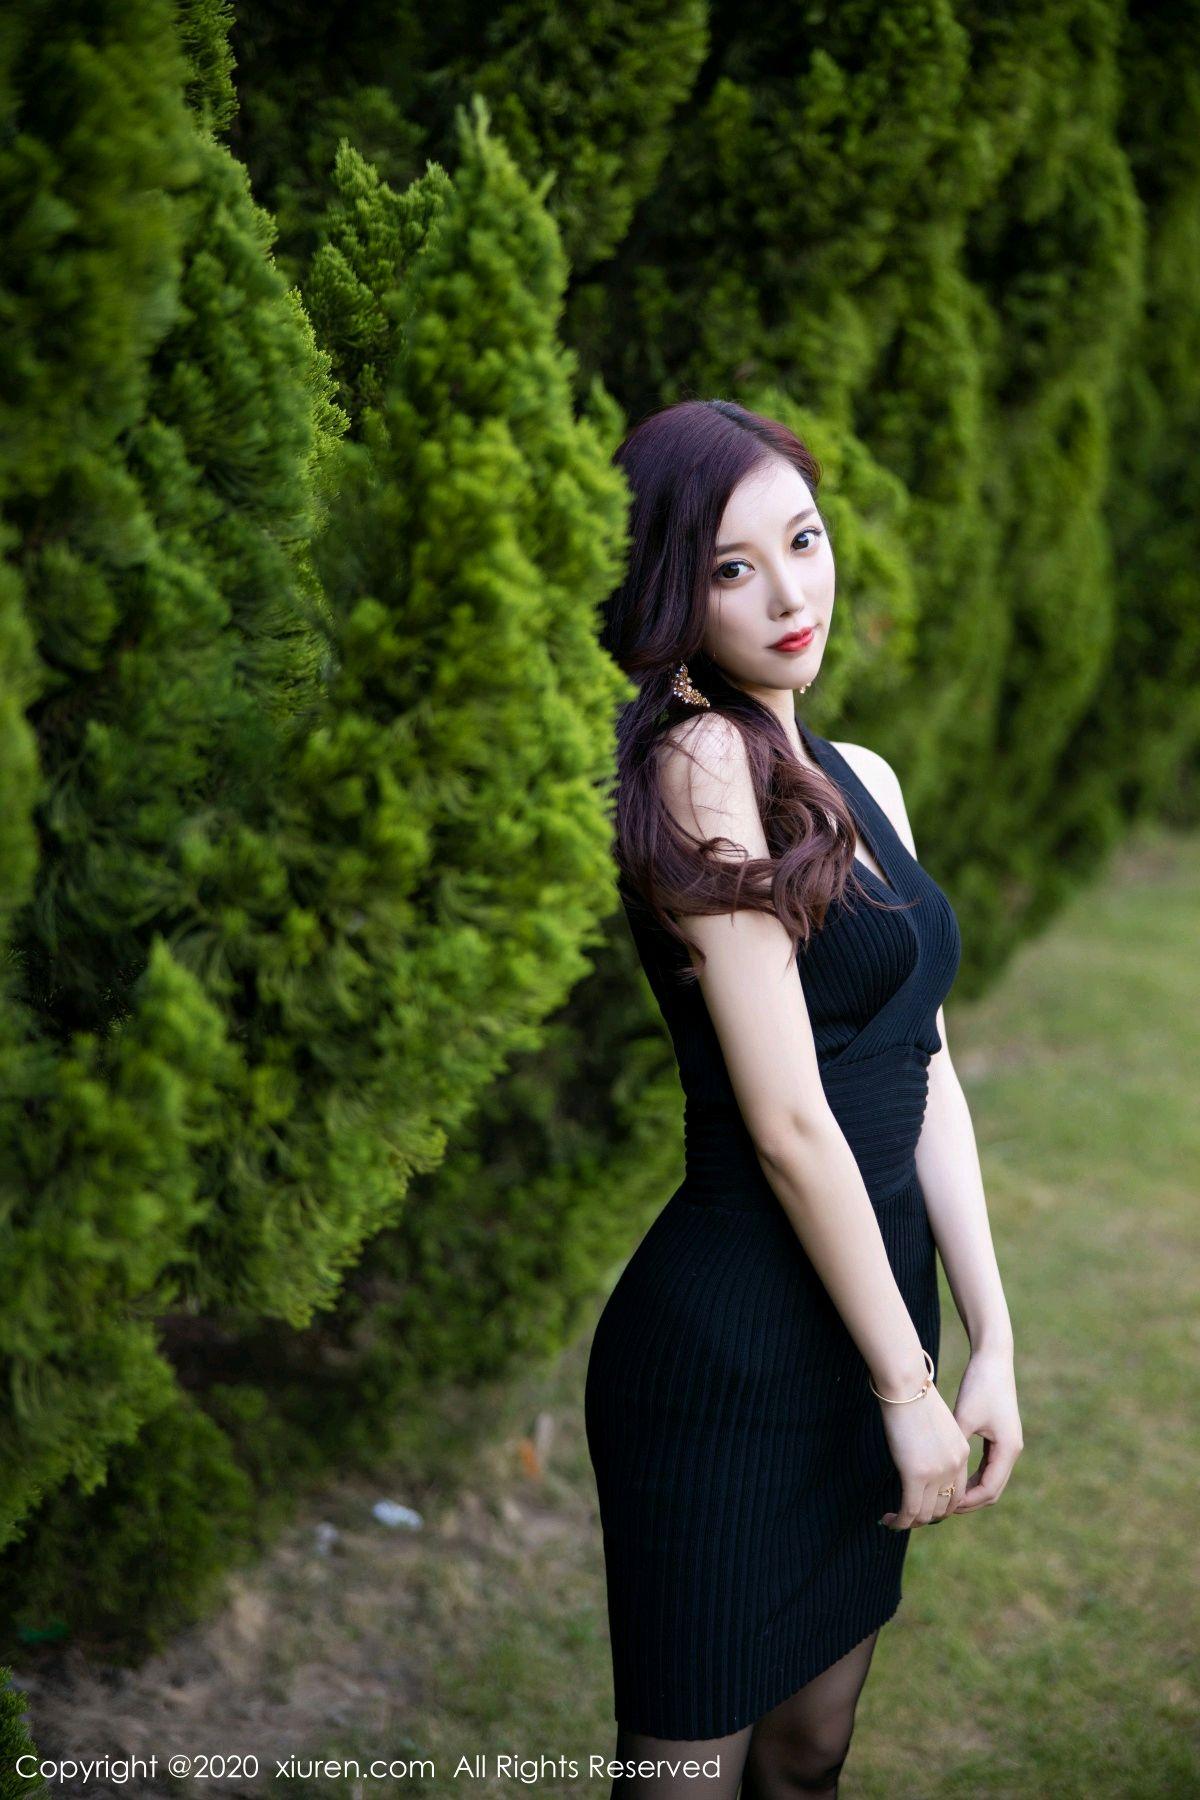 [XiuRen] Vol.2648 Yang Chen Chen 35P, Black Silk, Outdoor, Xiuren, Yang Chen Chen